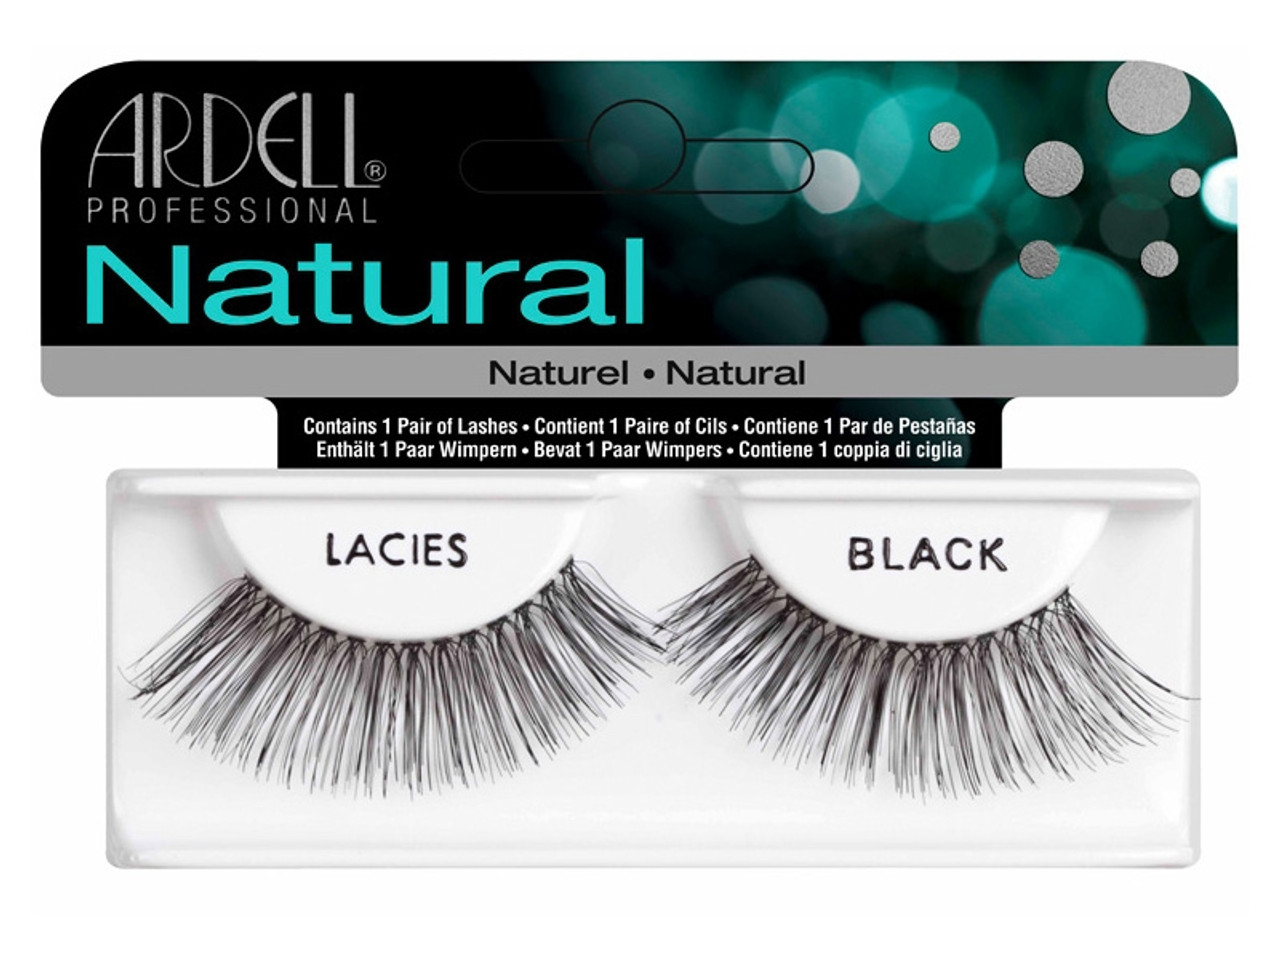 Ardell Natural Lashes - LaciesBlack